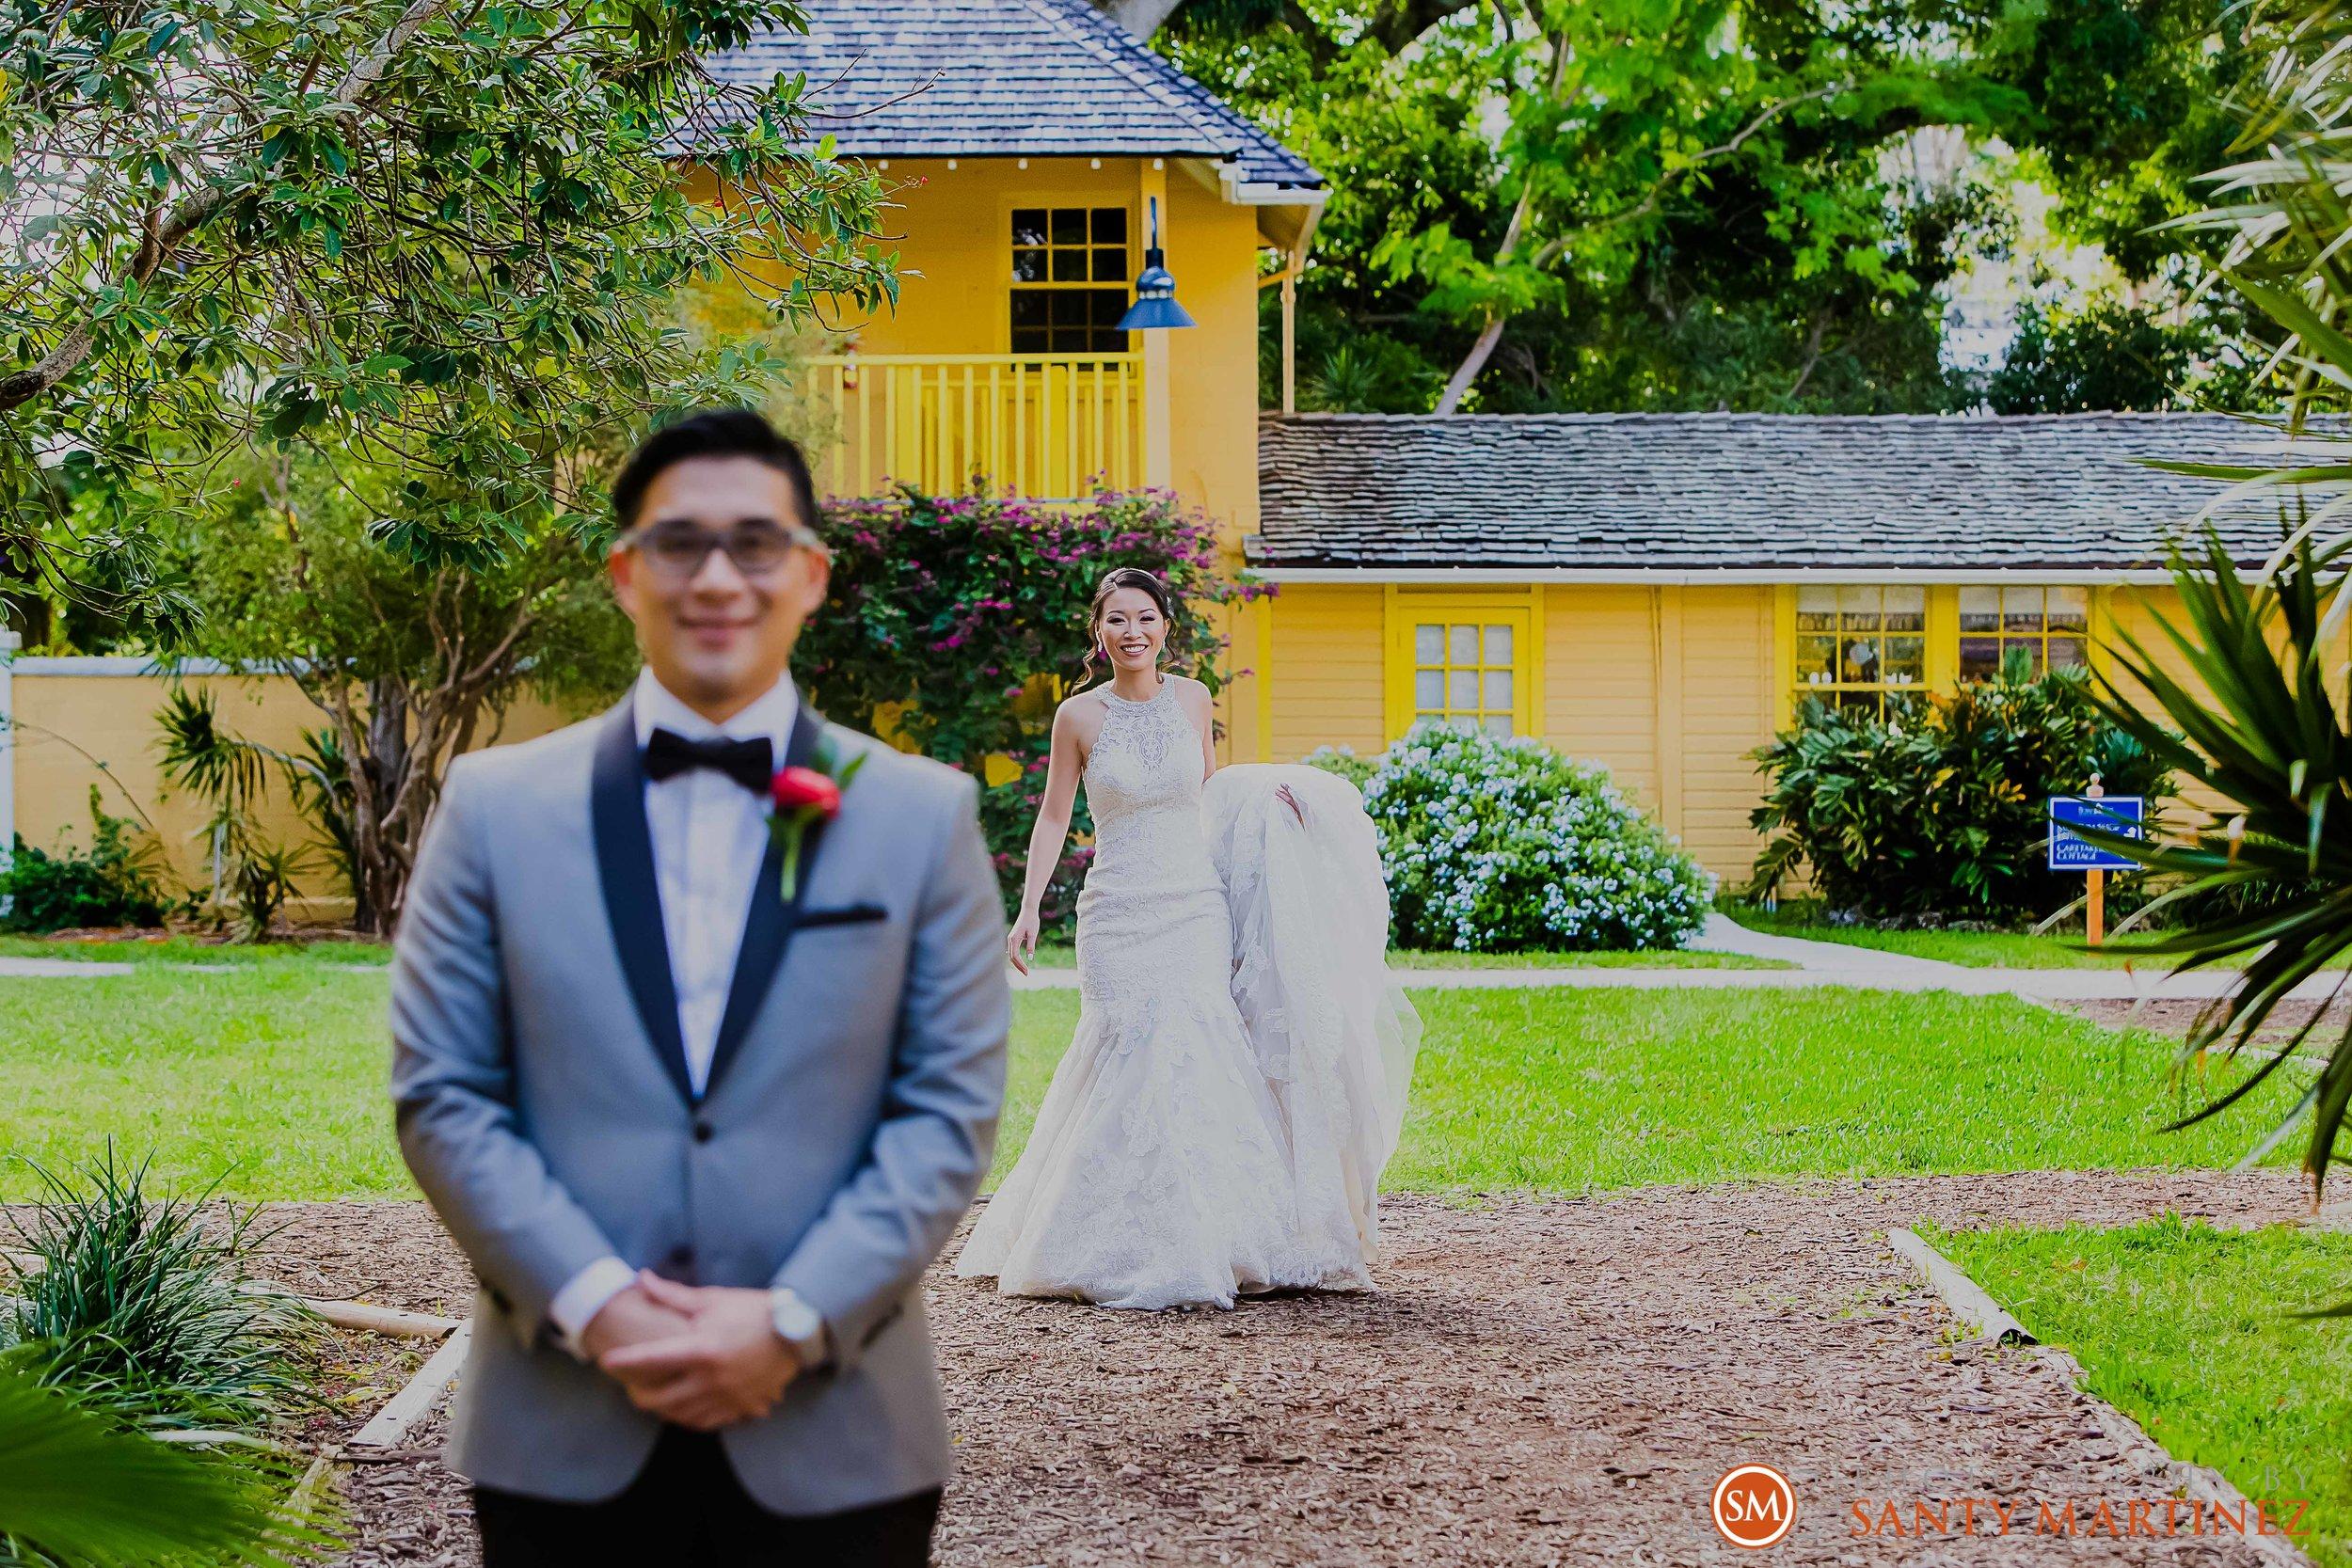 Wedding Bonnet House - Photography by Santy Martinez-11.jpg